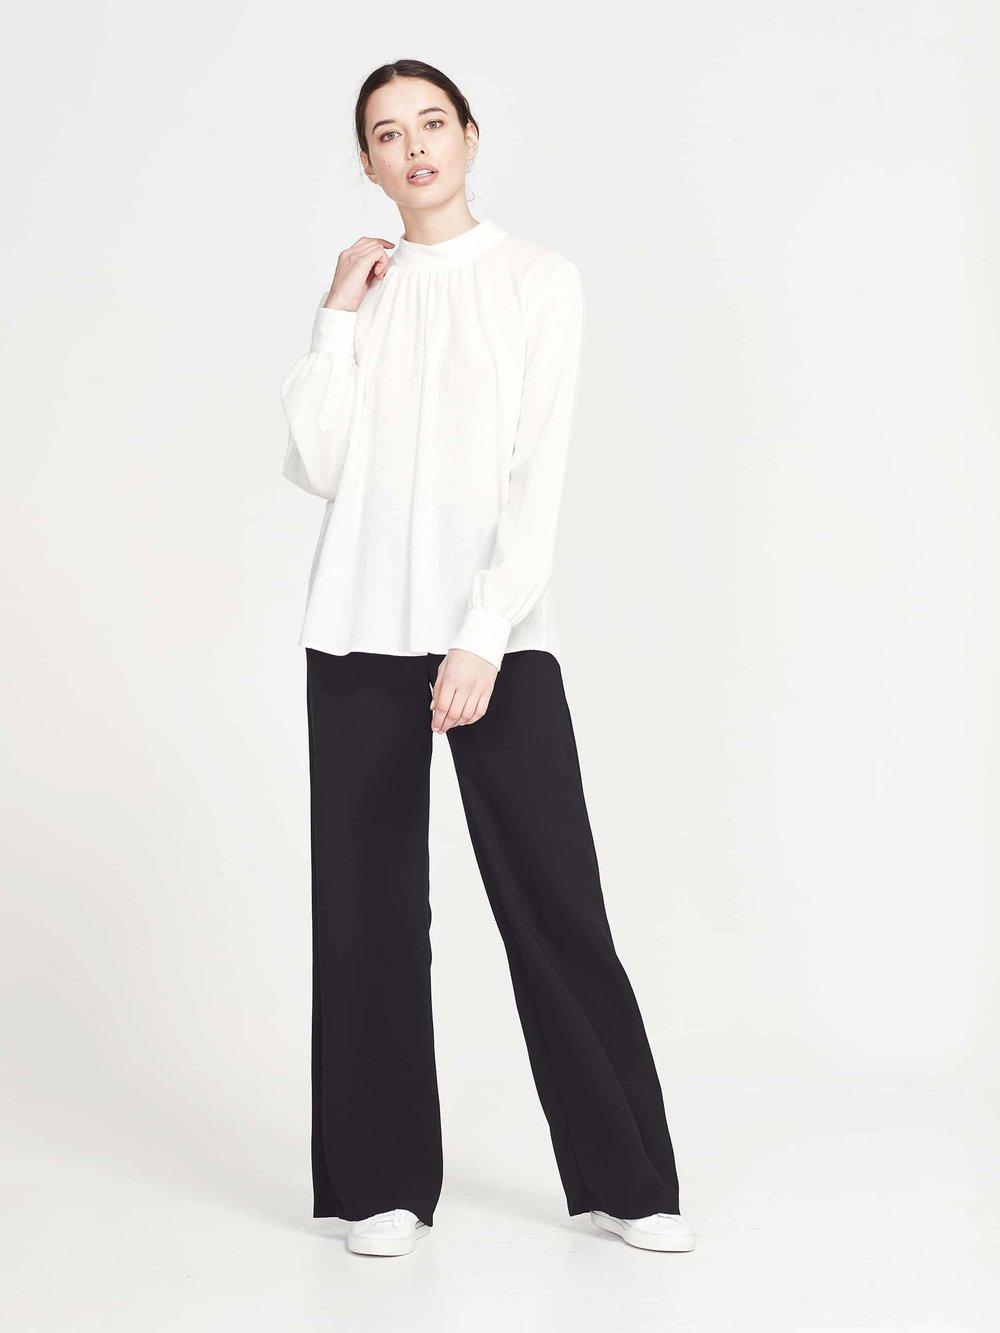 Juliette Hogan   Alice blouse, $349.